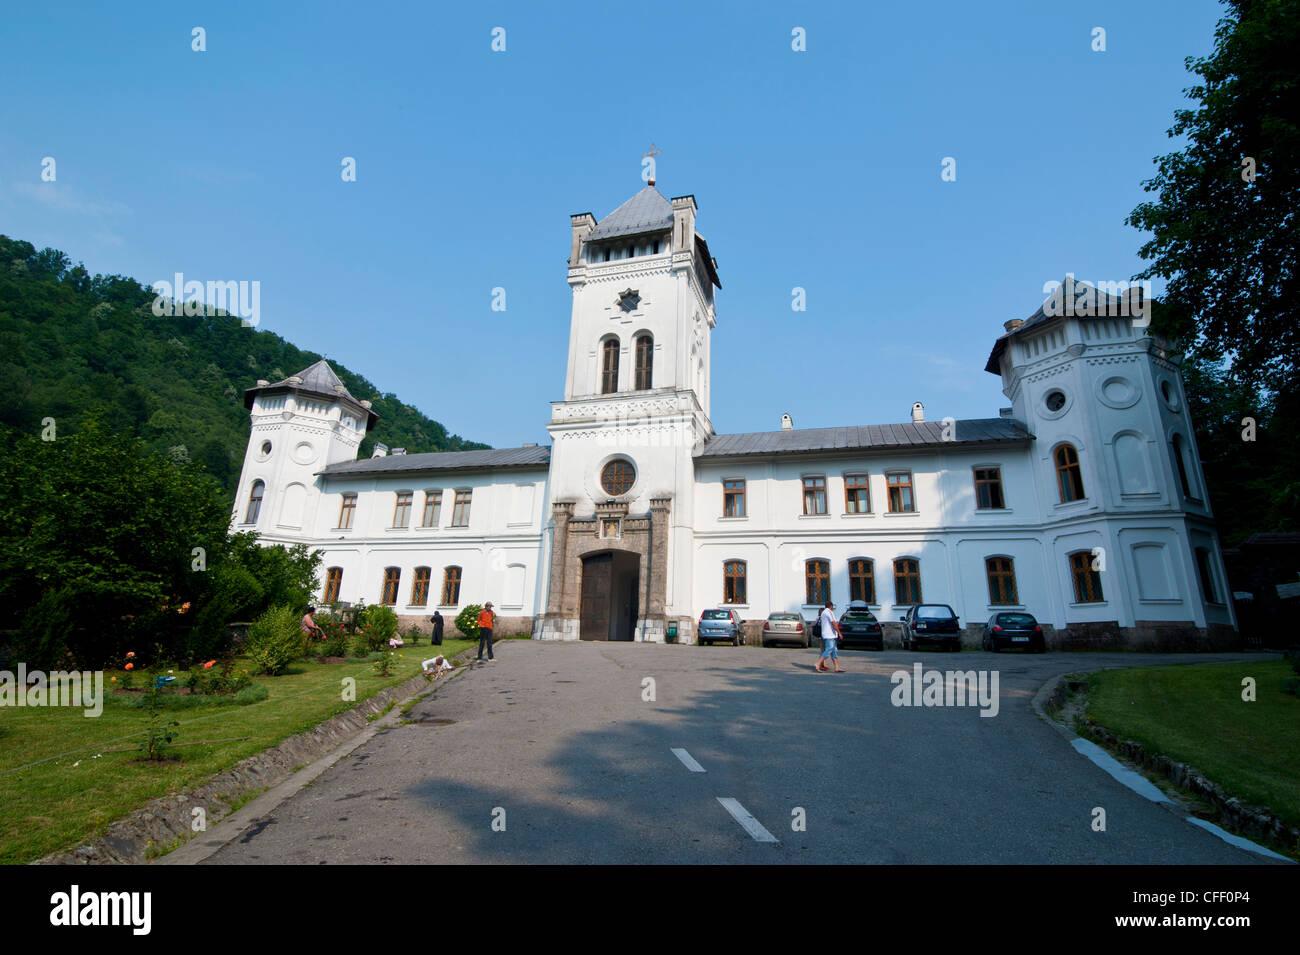 Monastery Secu, Moldova, Romania, Europe - Stock Image